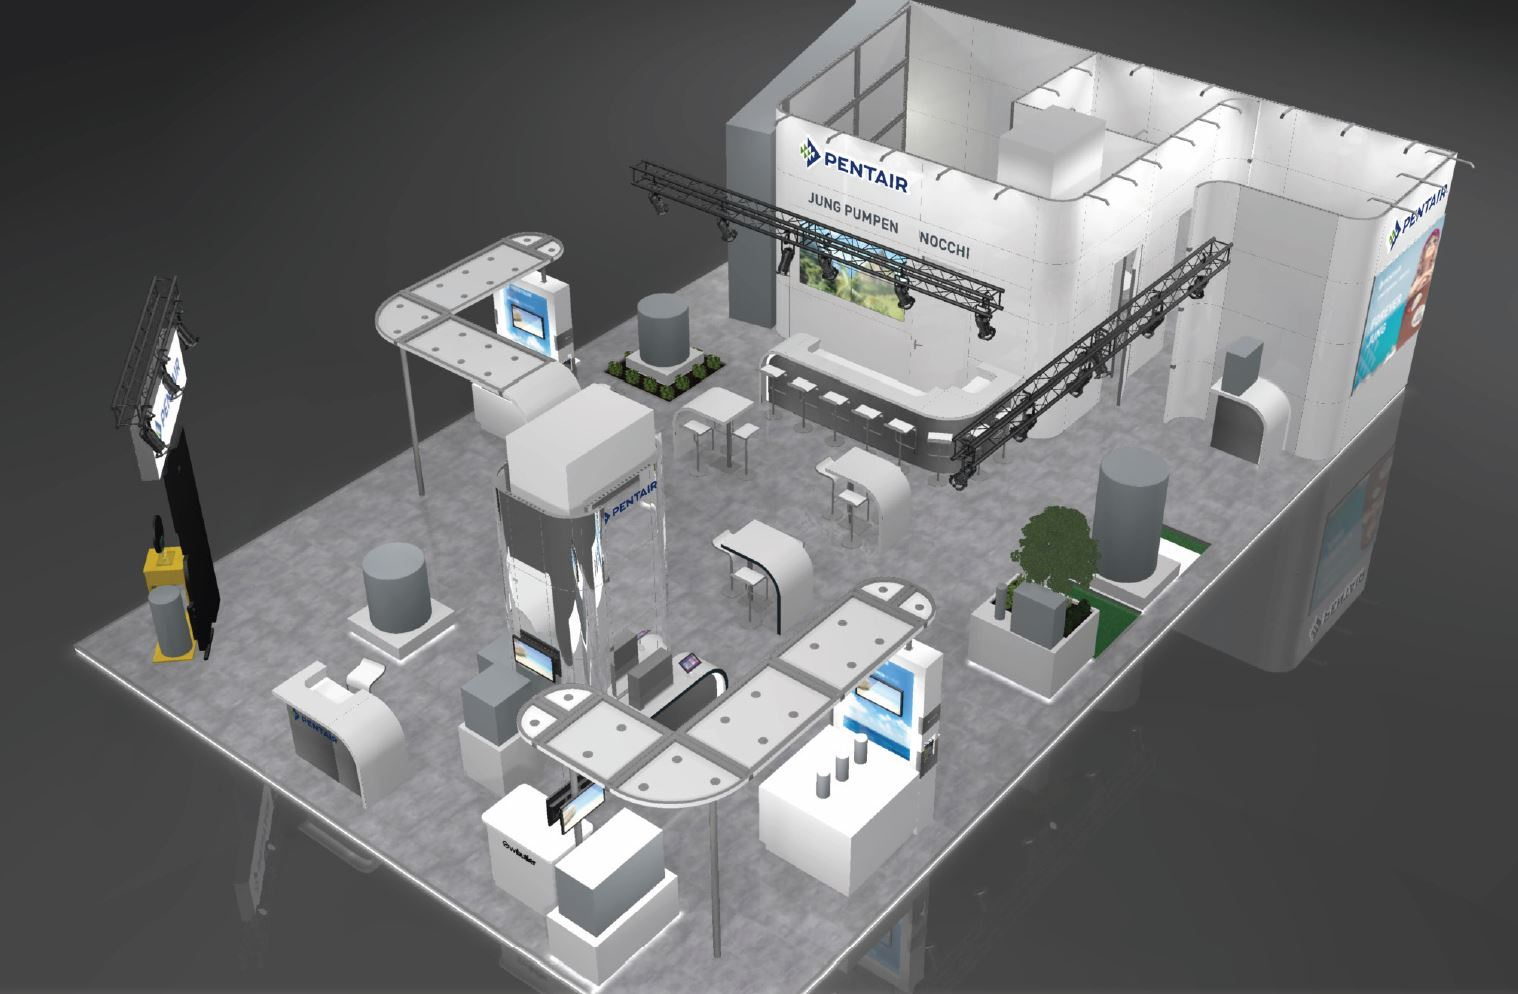 Abwassertechnik ist JUNG - Pentair JUNG PUMPEN GmbH - Pressemitteilung